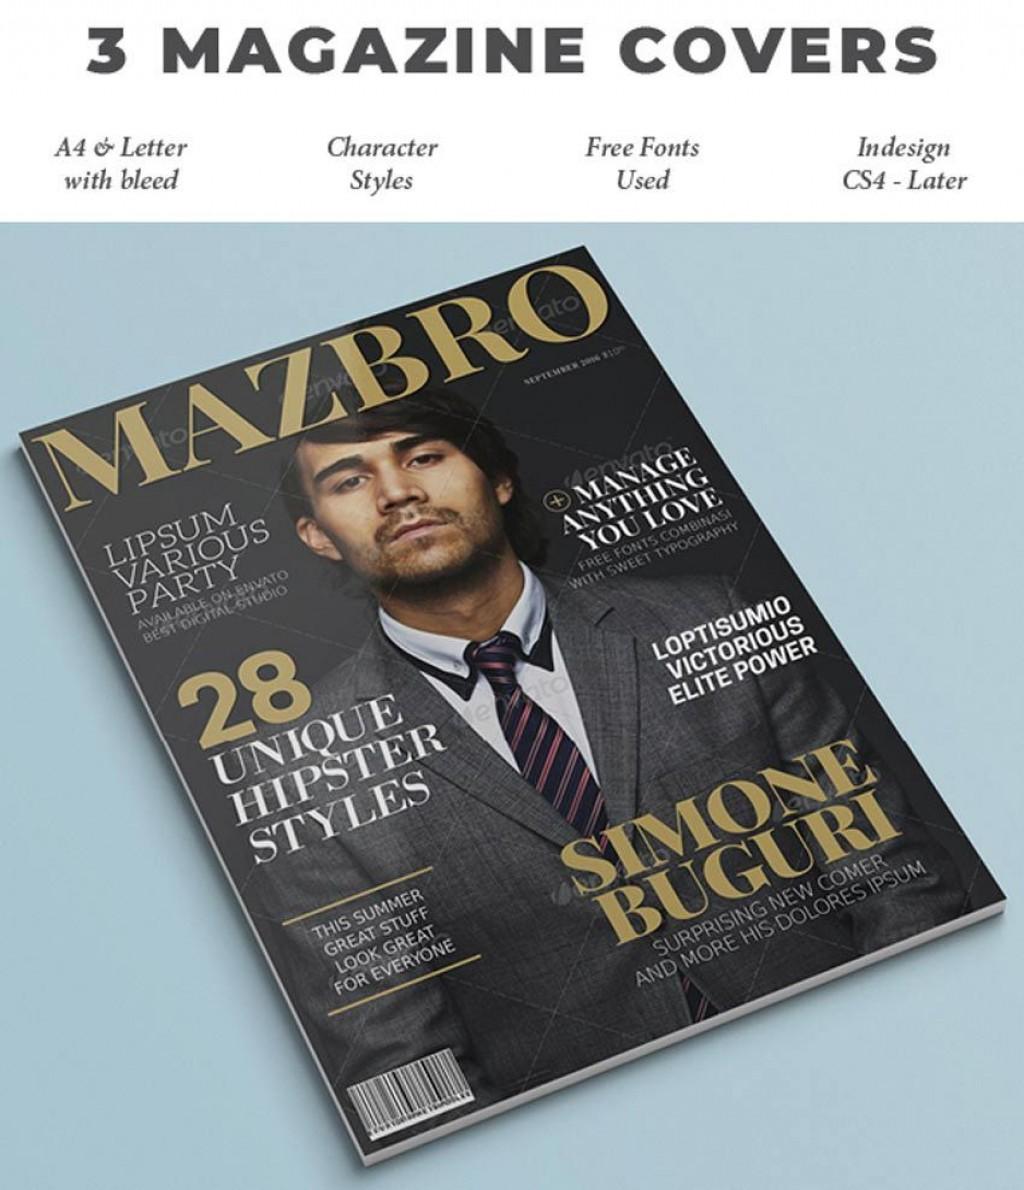 009 Impressive Photoshop Fashion Magazine Cover Template Free Example Large